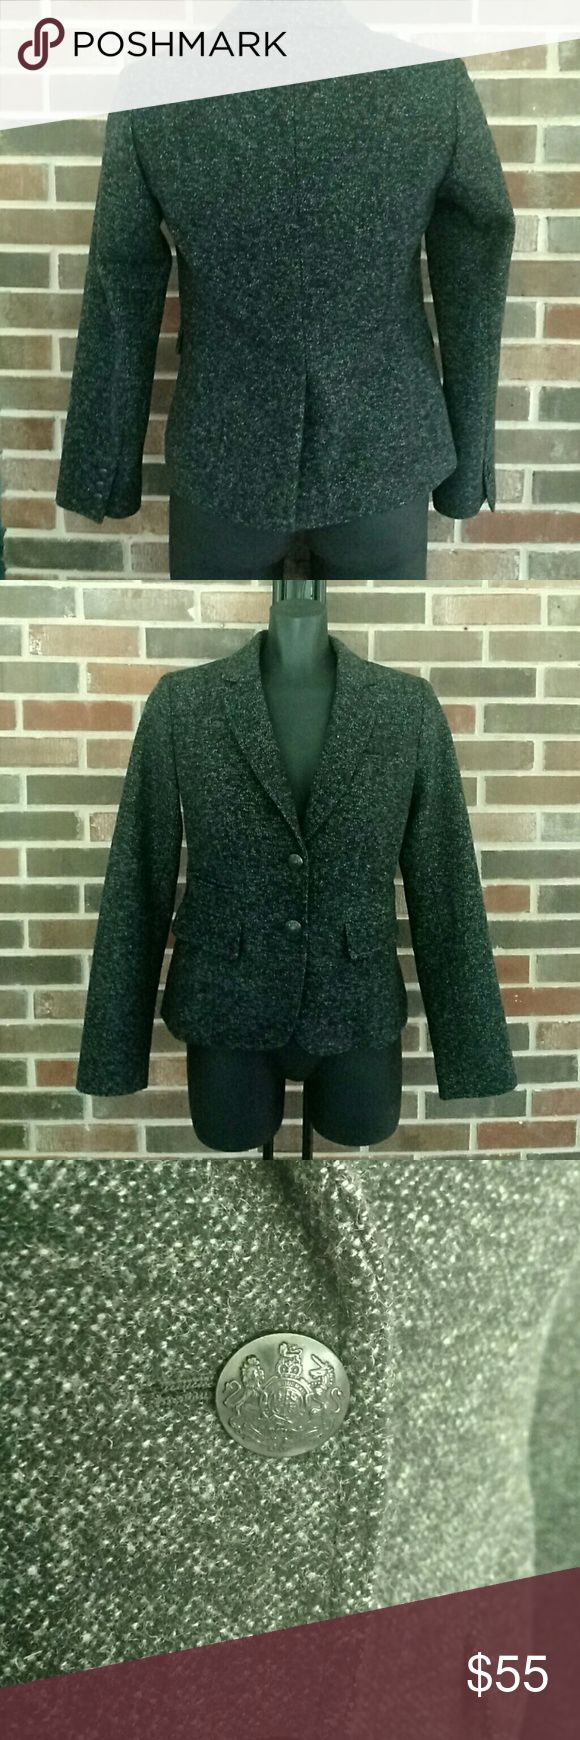 Banana Republic Tweed Blazer 100% wool Banana Republic dark grey Tweed Blazer 100% wool, crest accent buttons, lightly loved Banana Republic Jackets & Coats Blazers